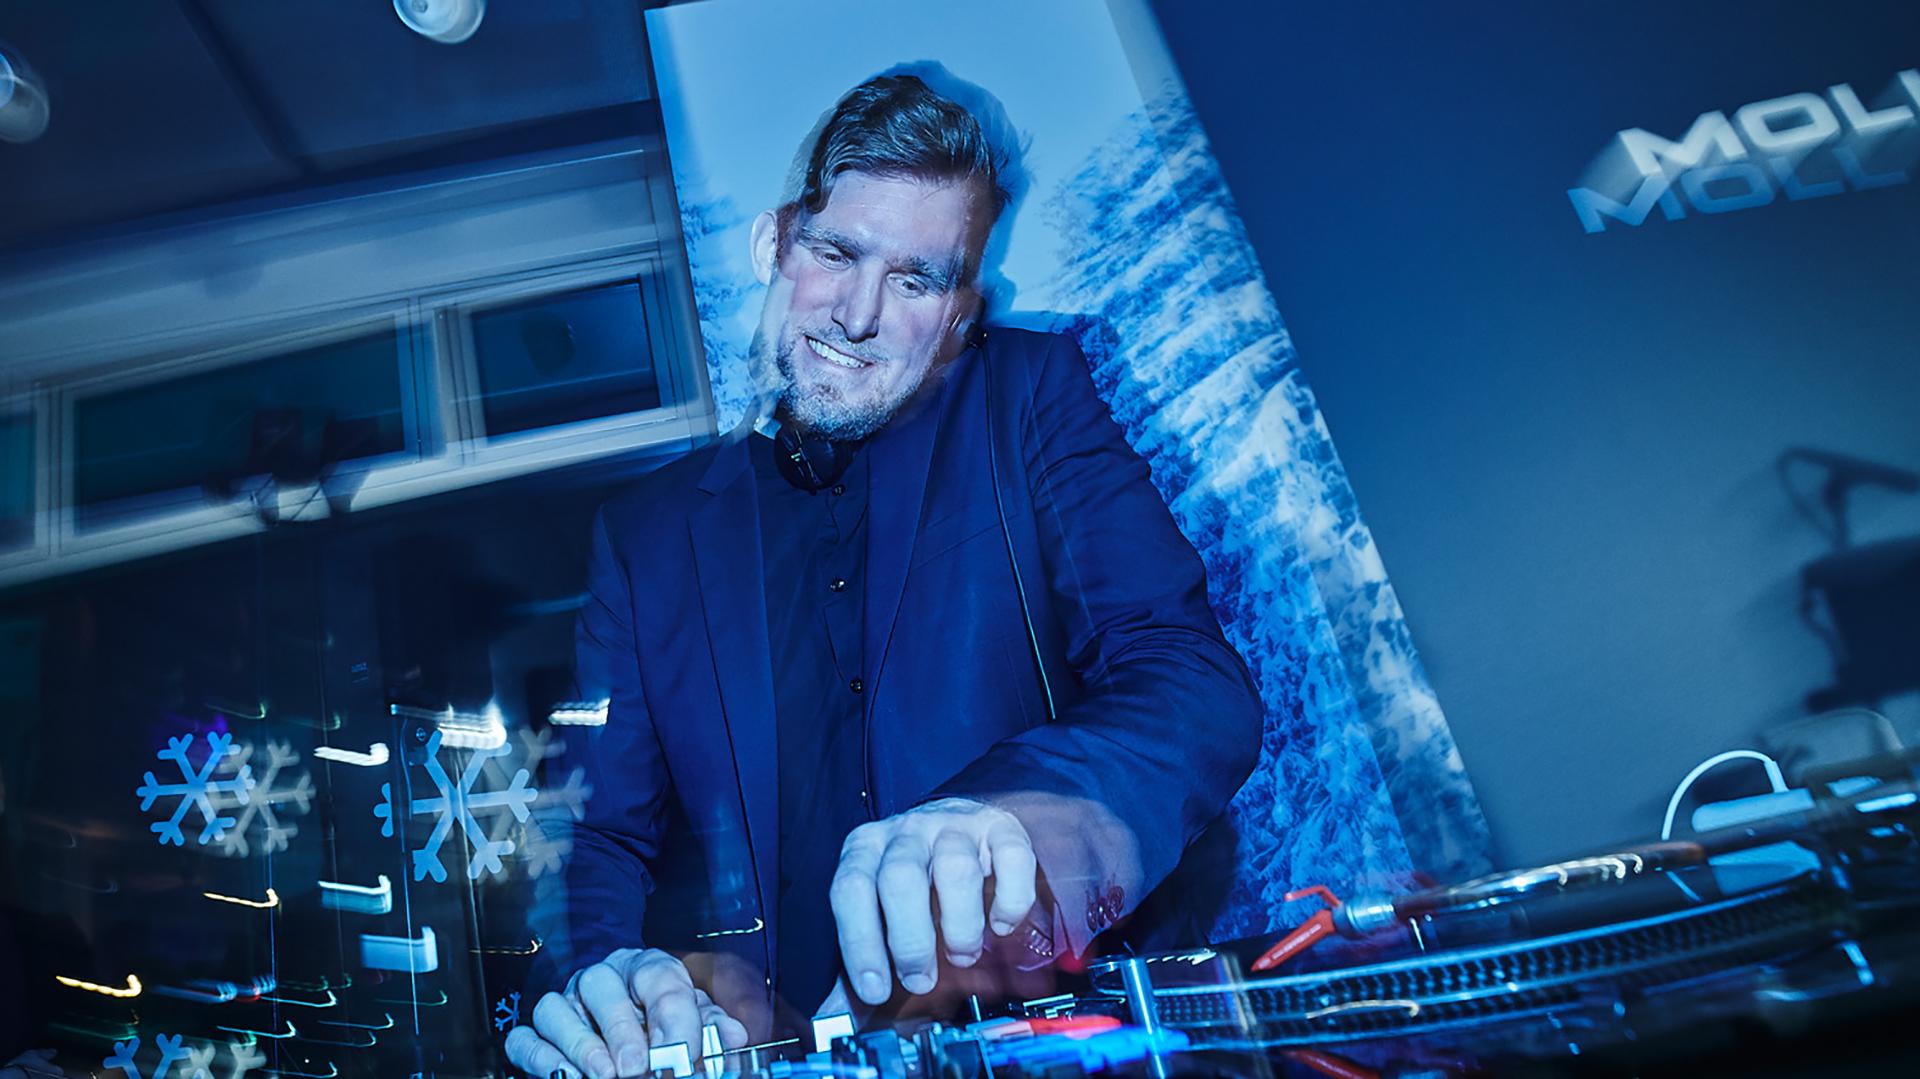 DJ-Neils-plus-Live-Acts-Eventband-Eventact-Online-Live-2021-02